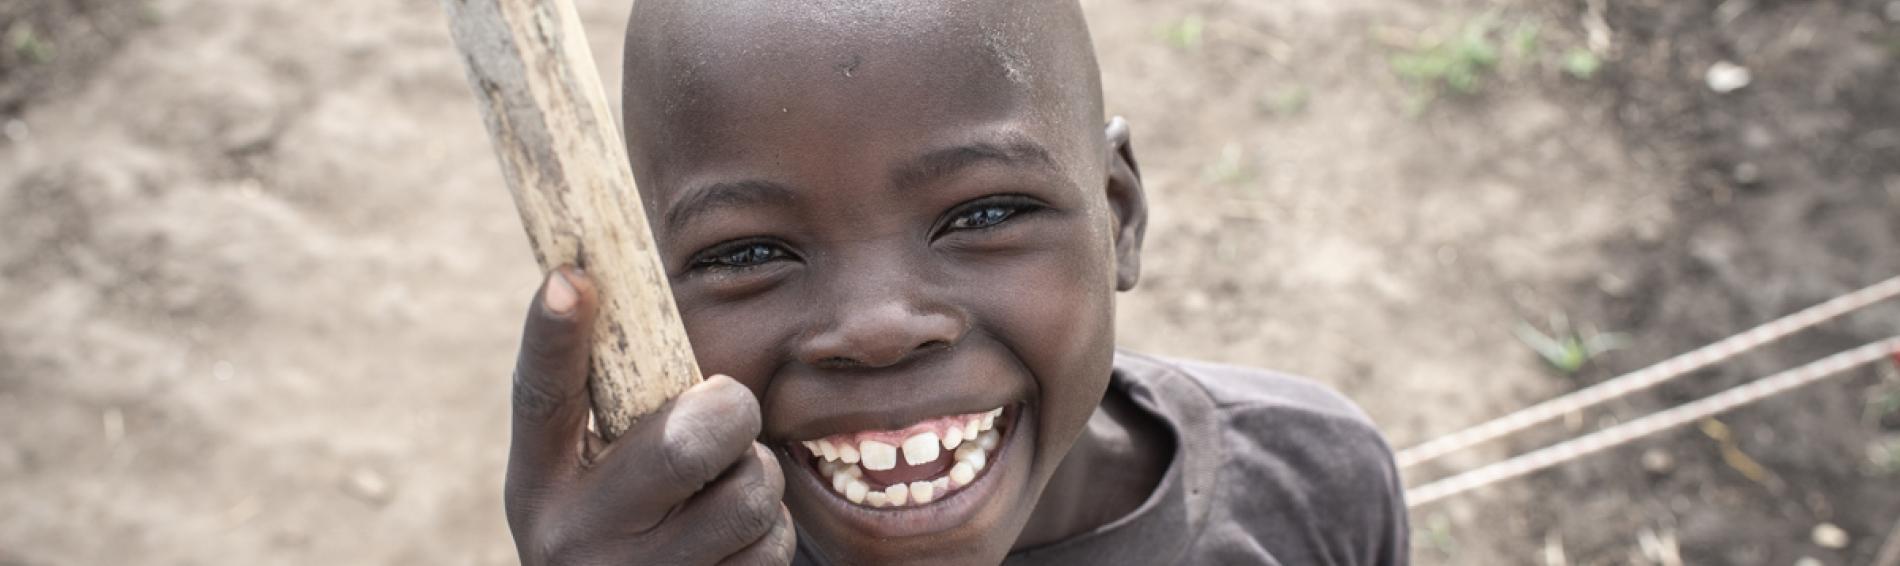 Niño sonrie a la cámara